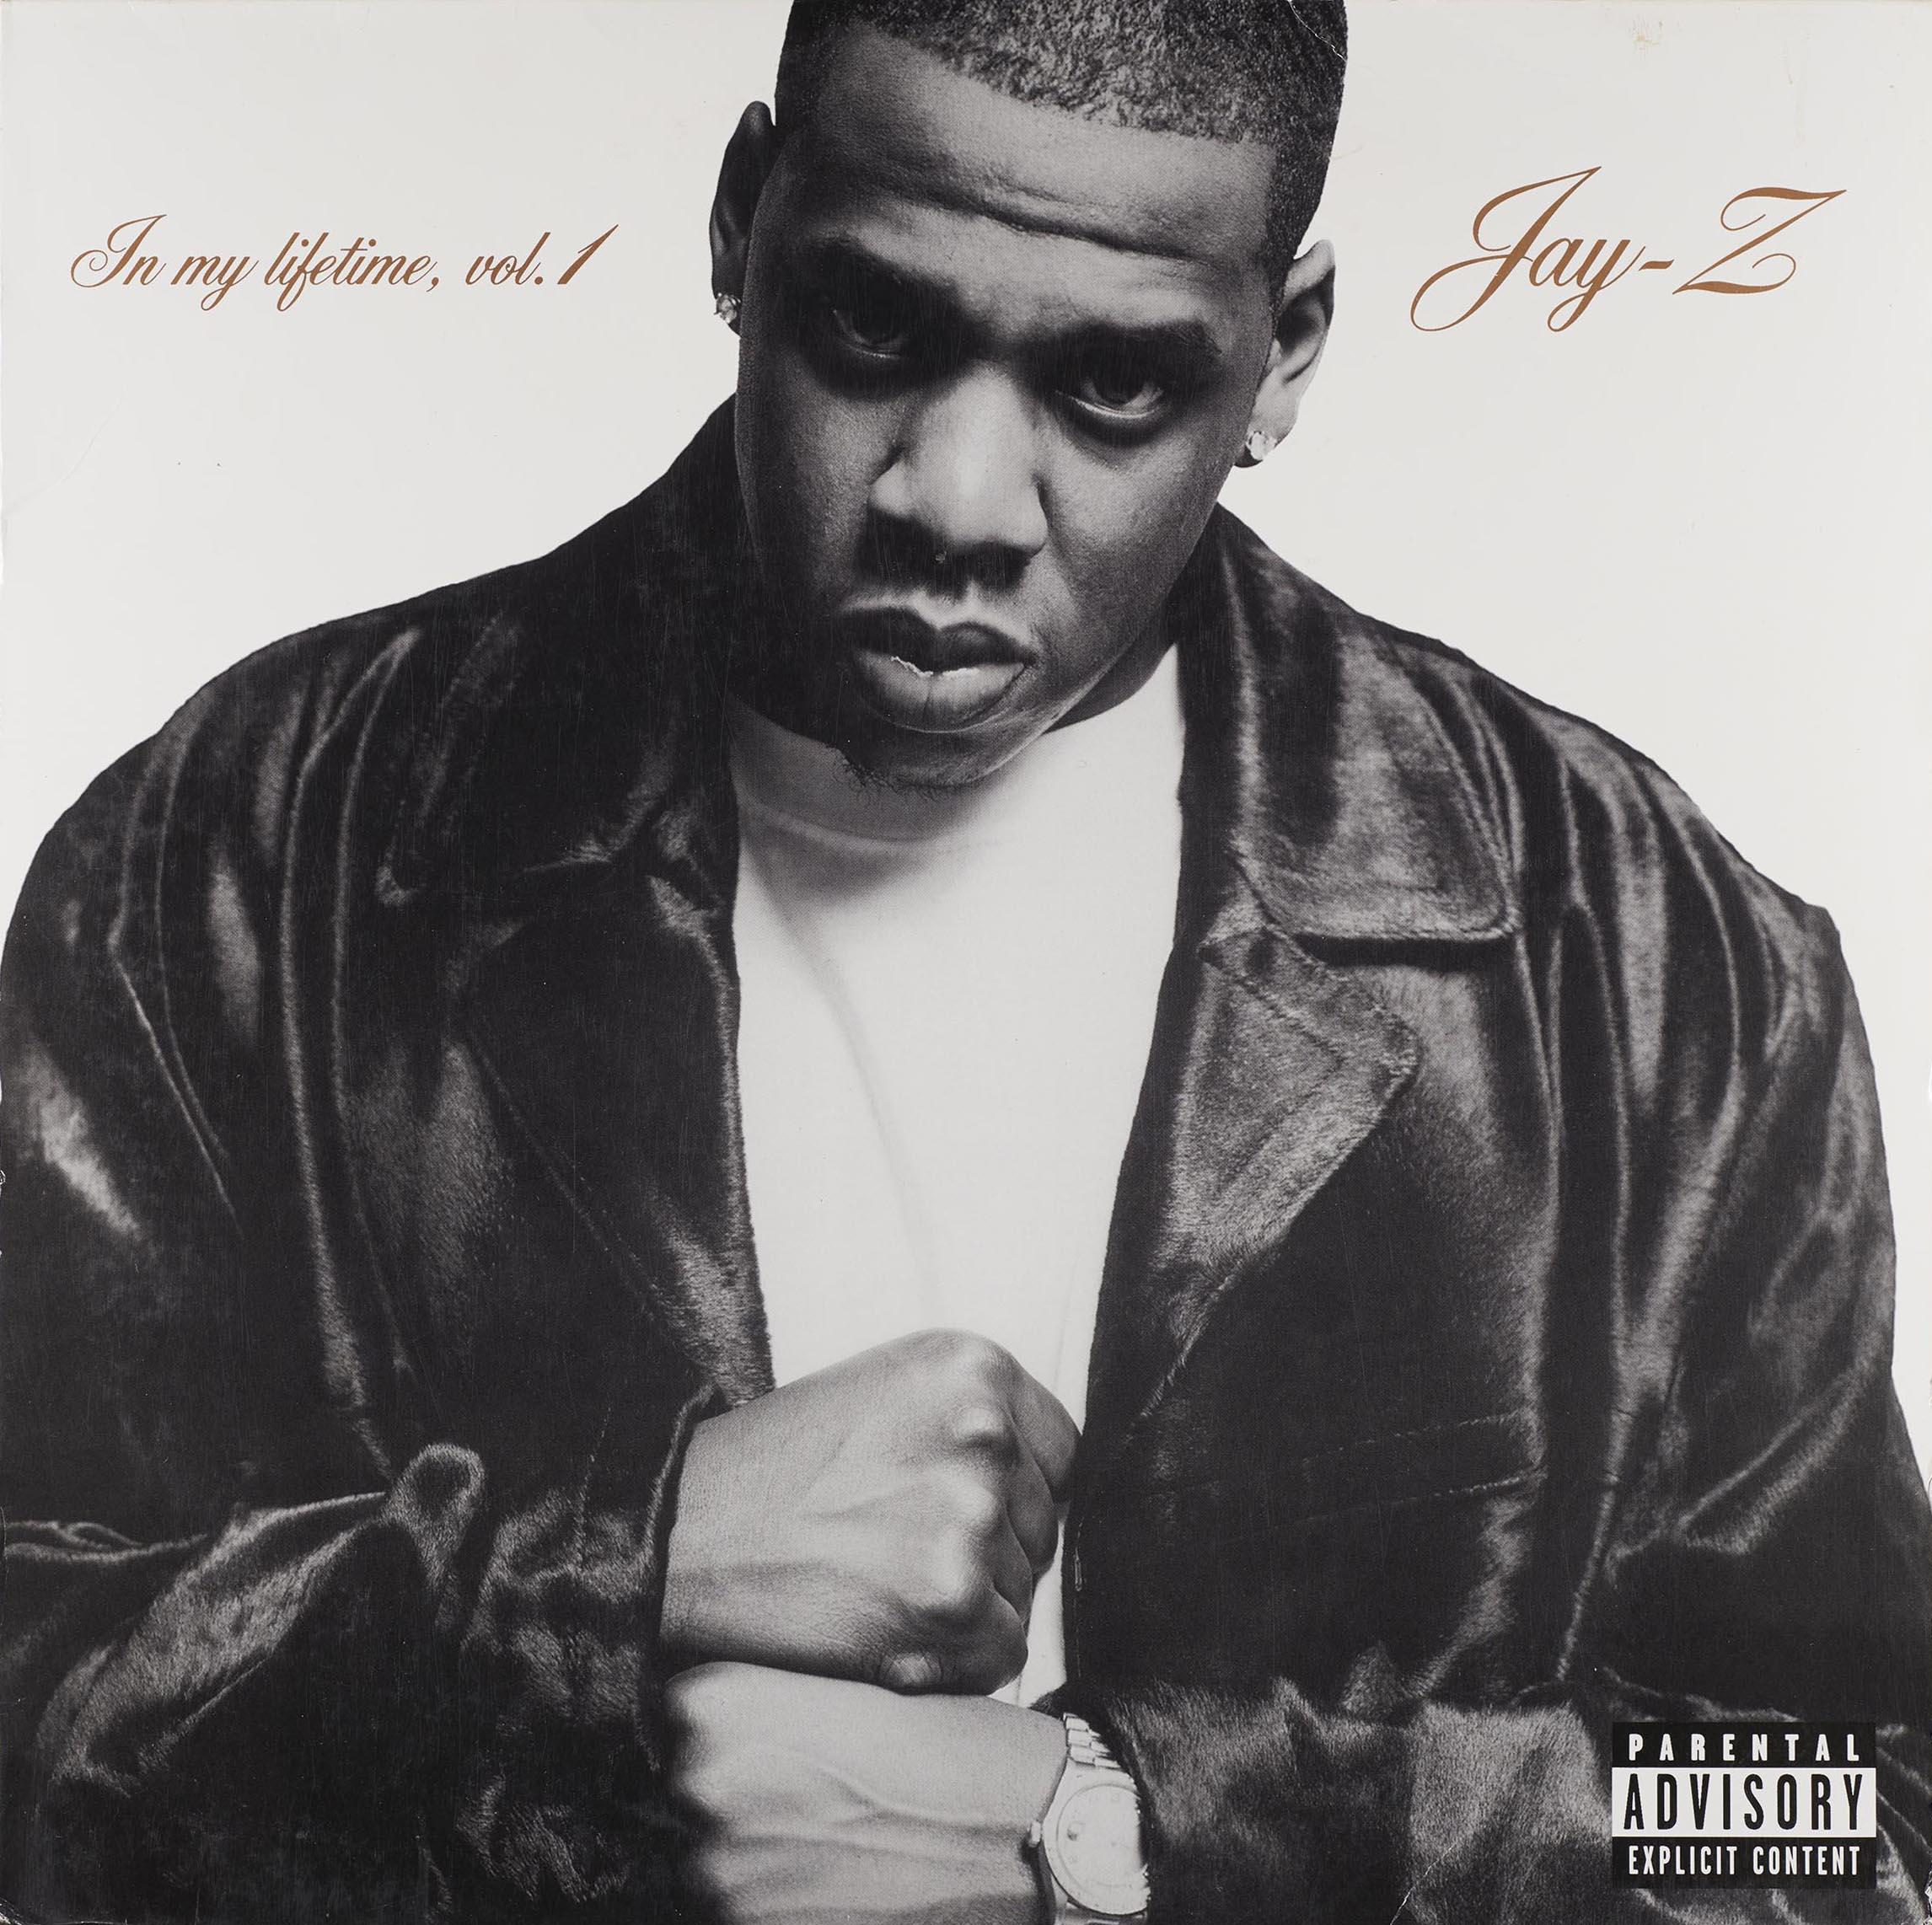 JAY-Z In My Lifetime vol. 1